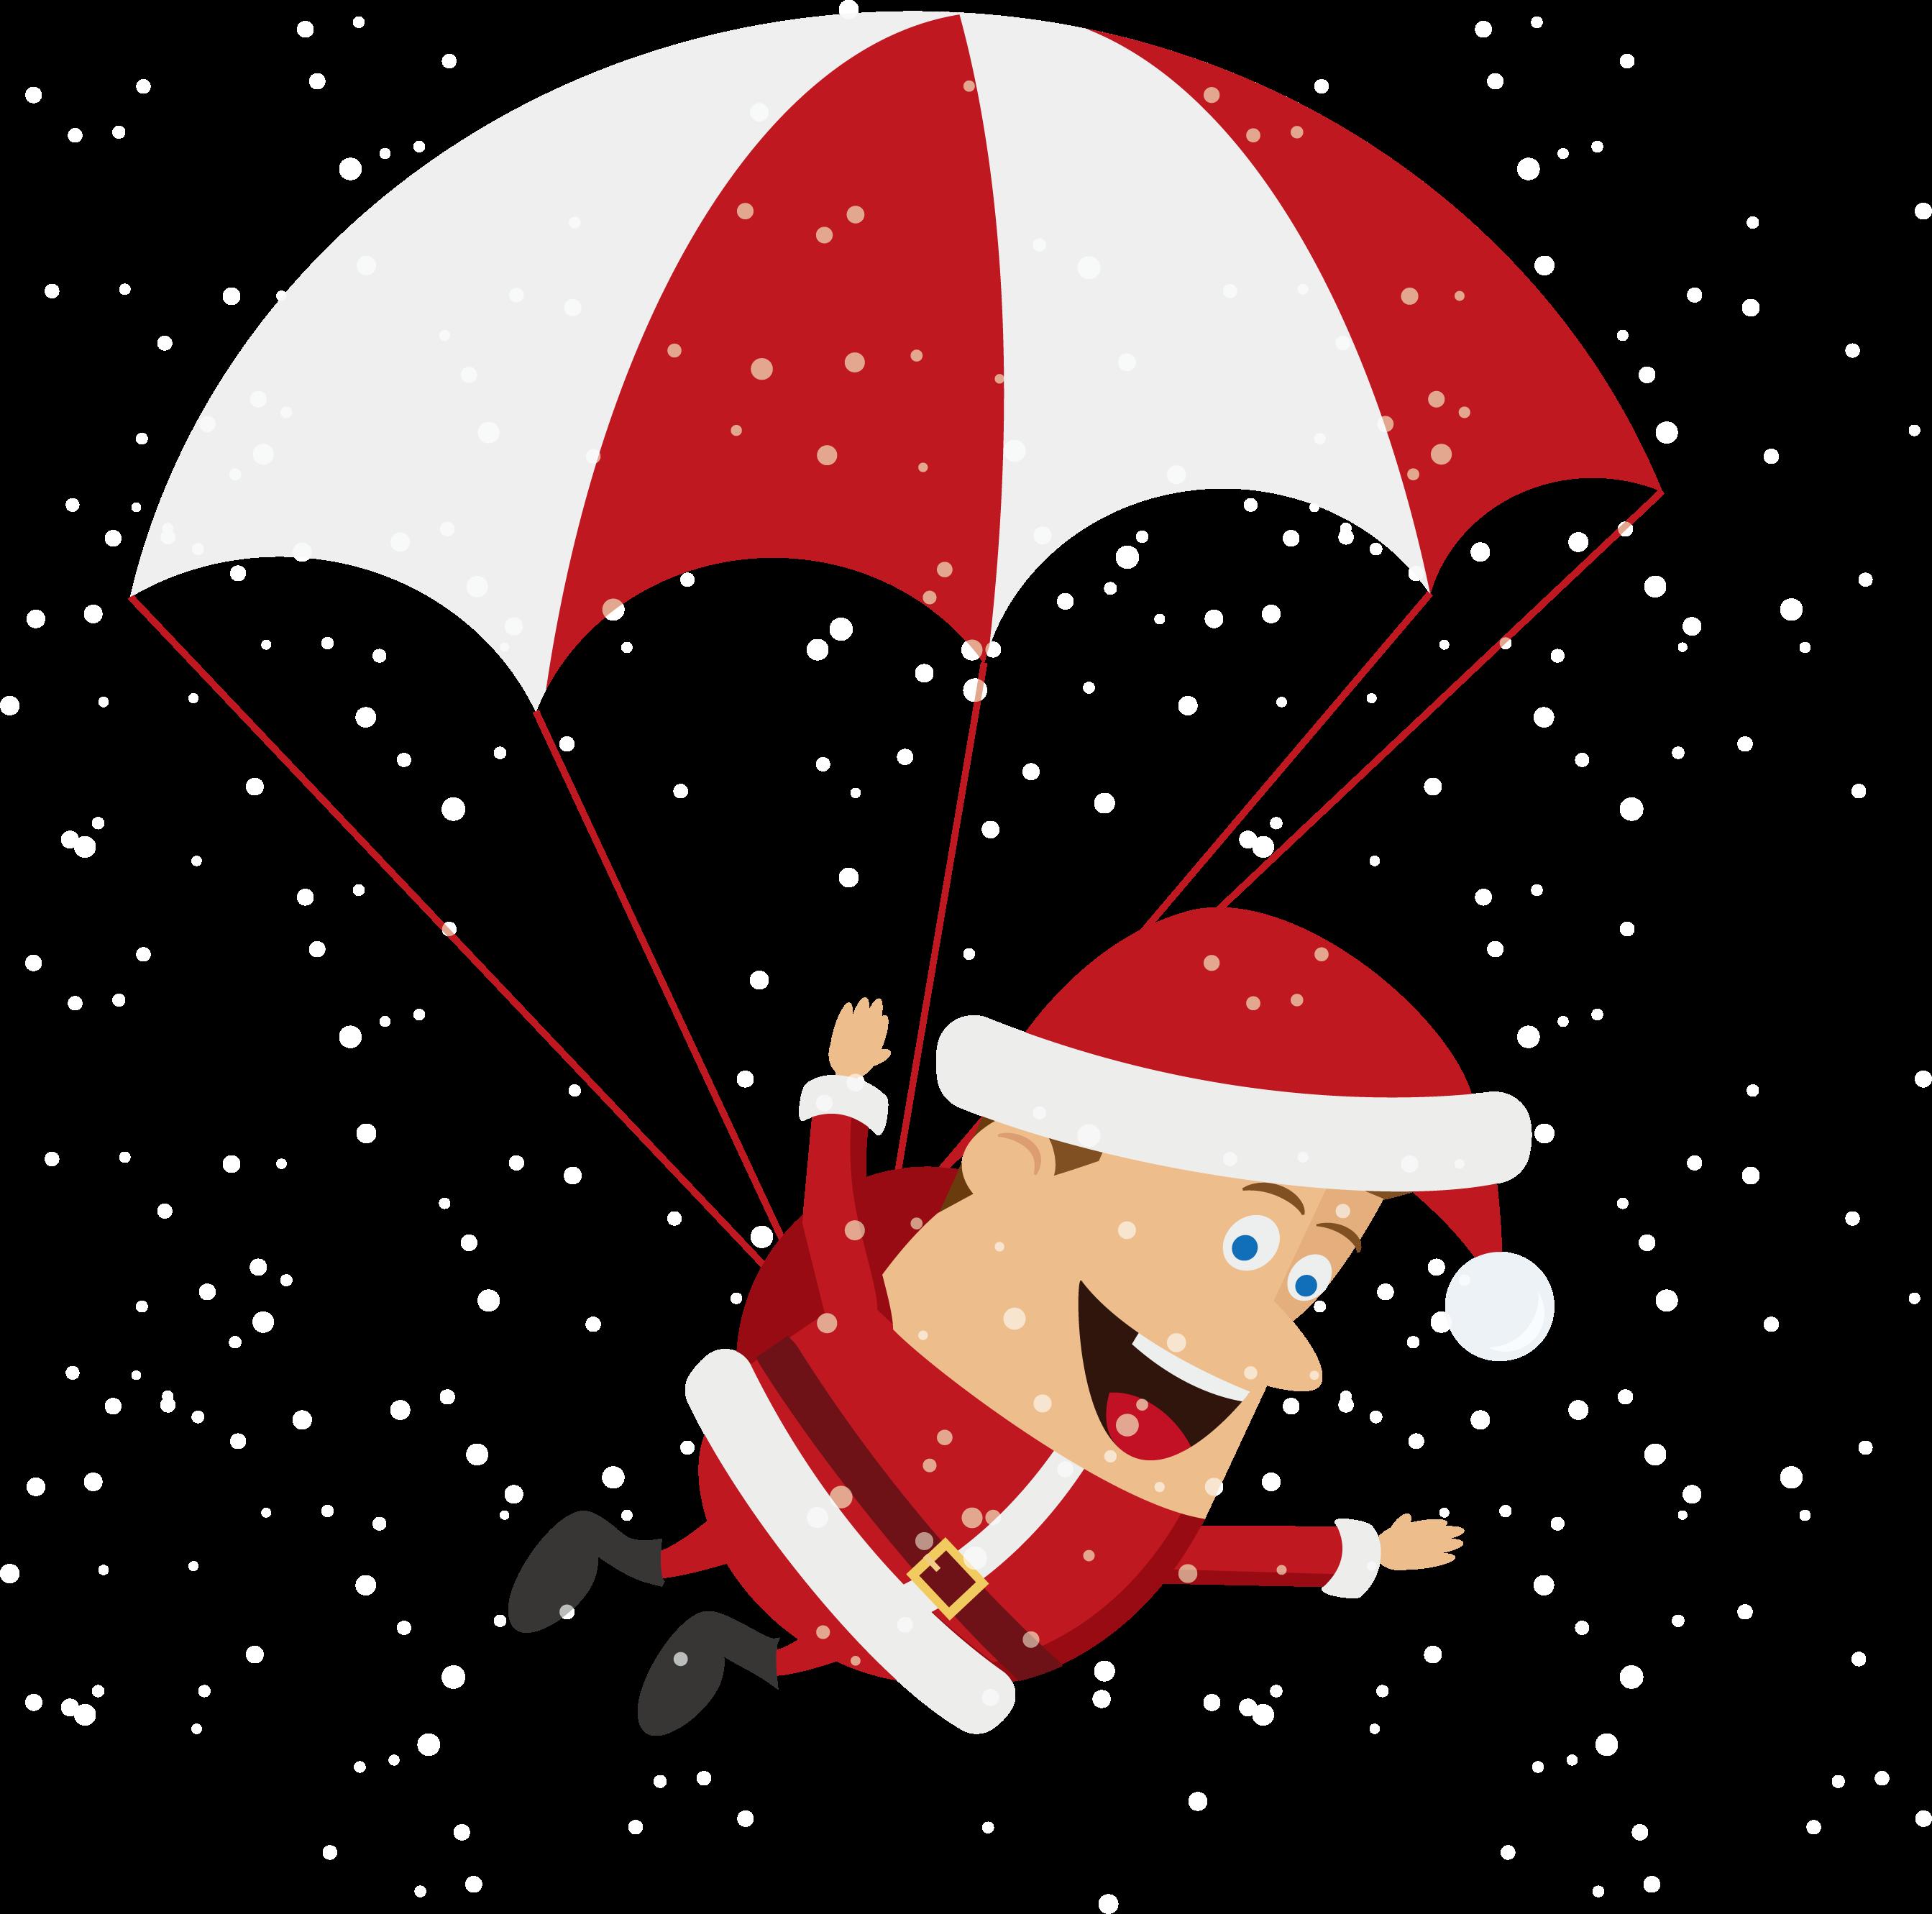 Eyes clipart santa claus. Christmas tree decoration cartoon